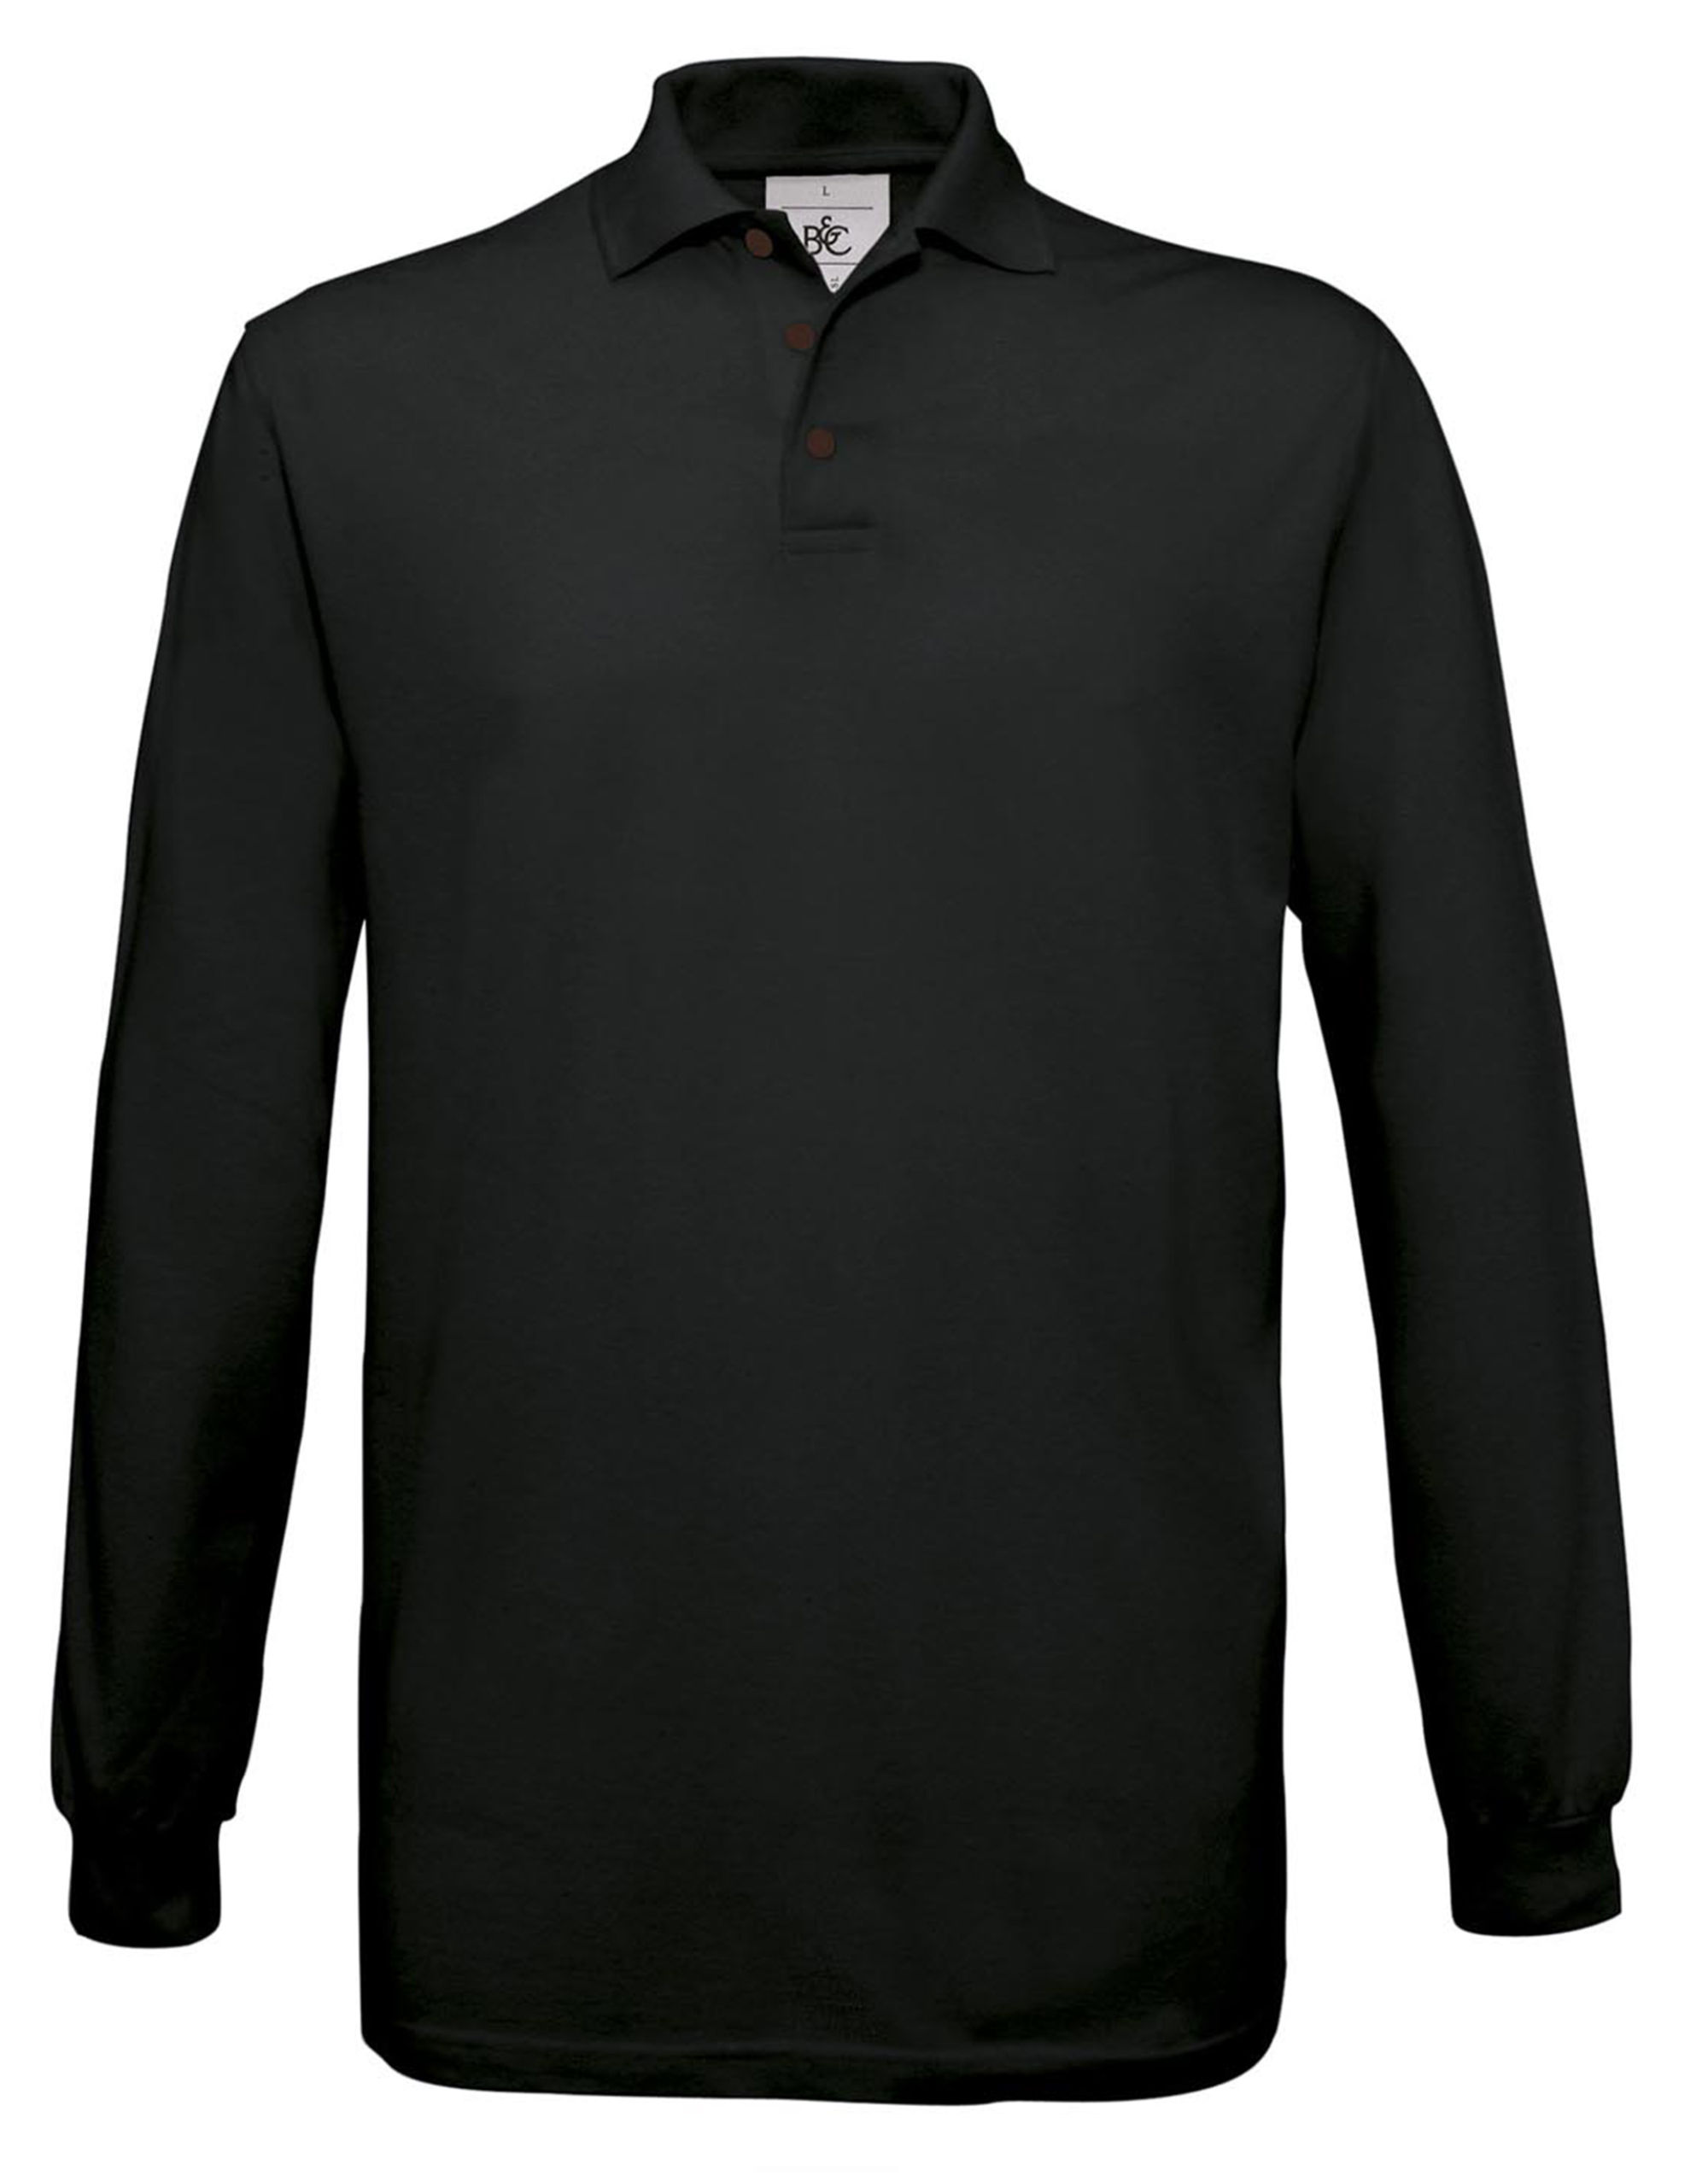 B&c Safran L/sleeve Polo Shirt